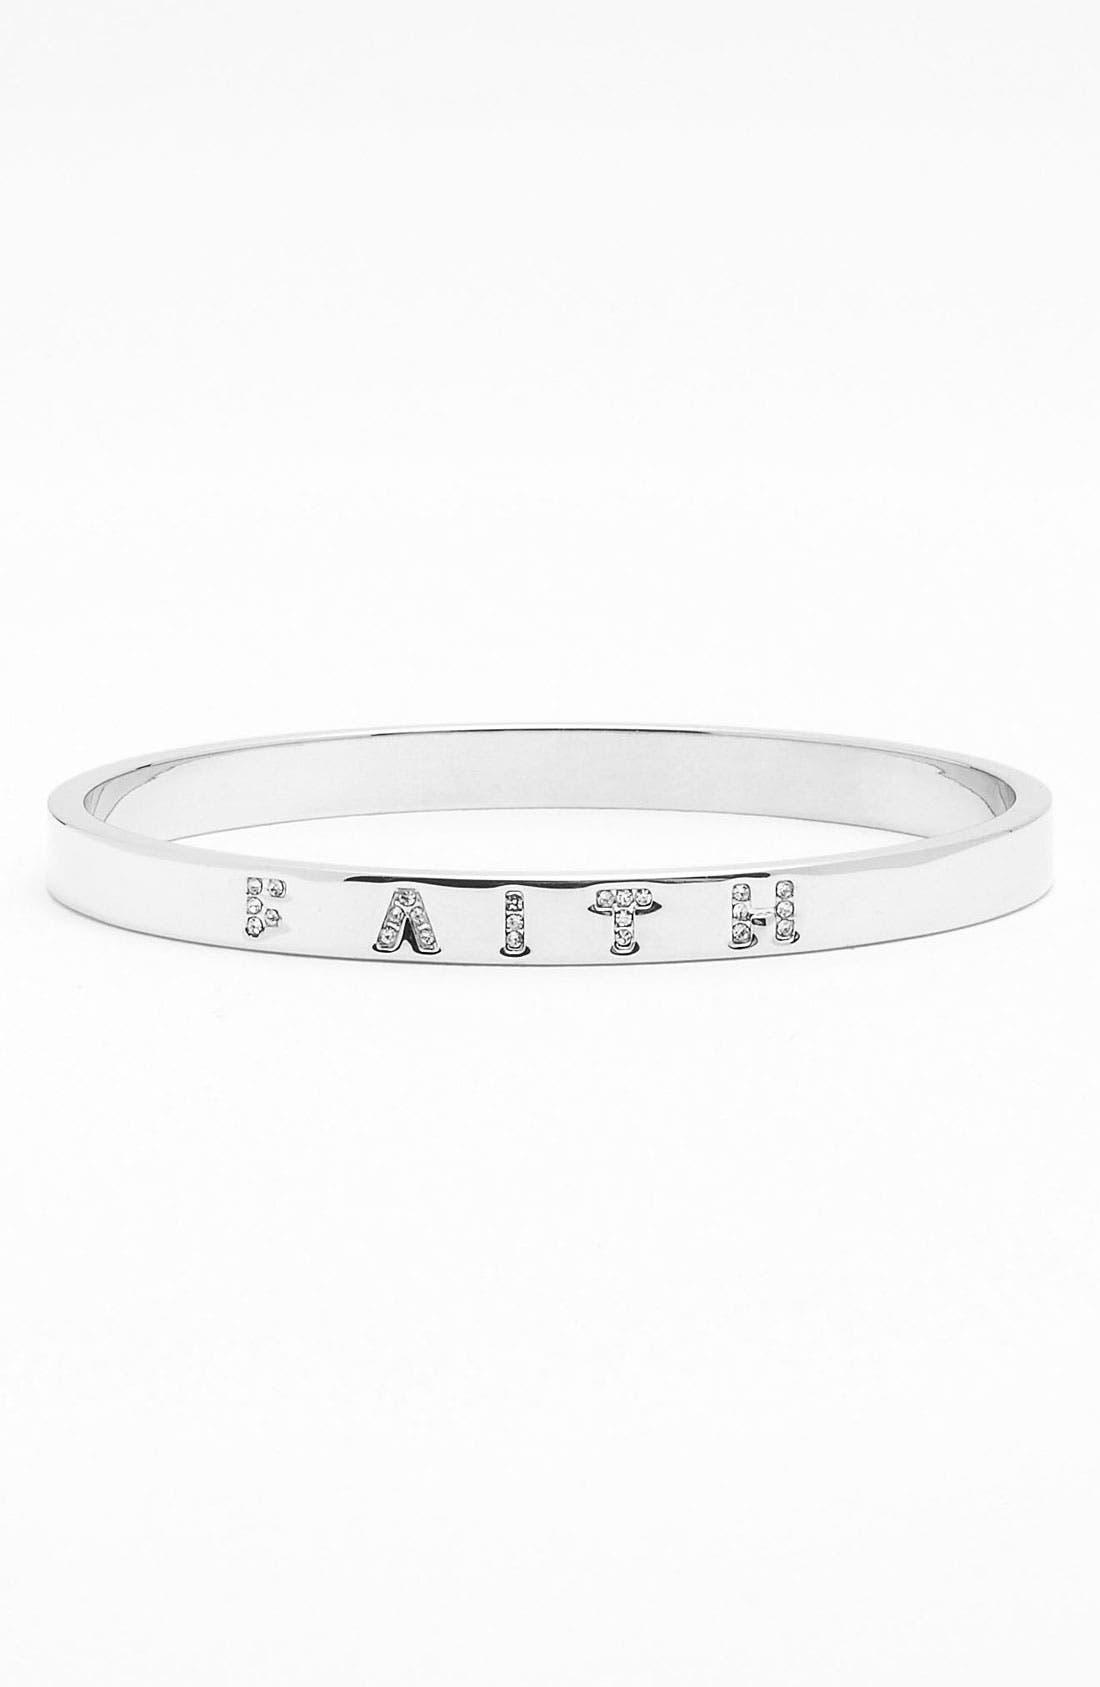 Main Image - Ariella Collection 'Messages - Faith' Pavé Bangle